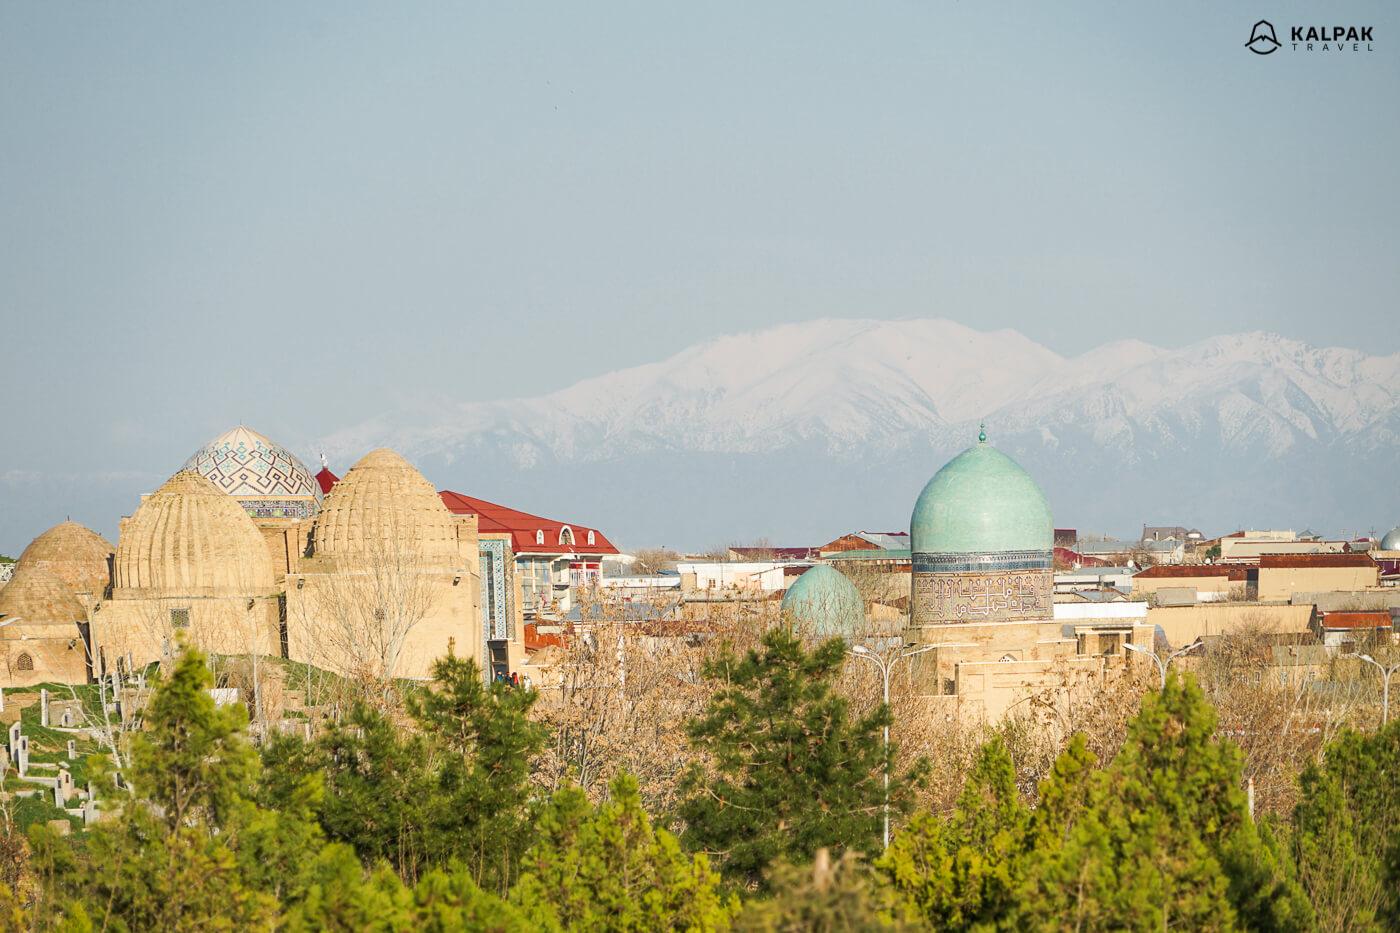 Shahizinda and Afrosiyob view in Samarkand